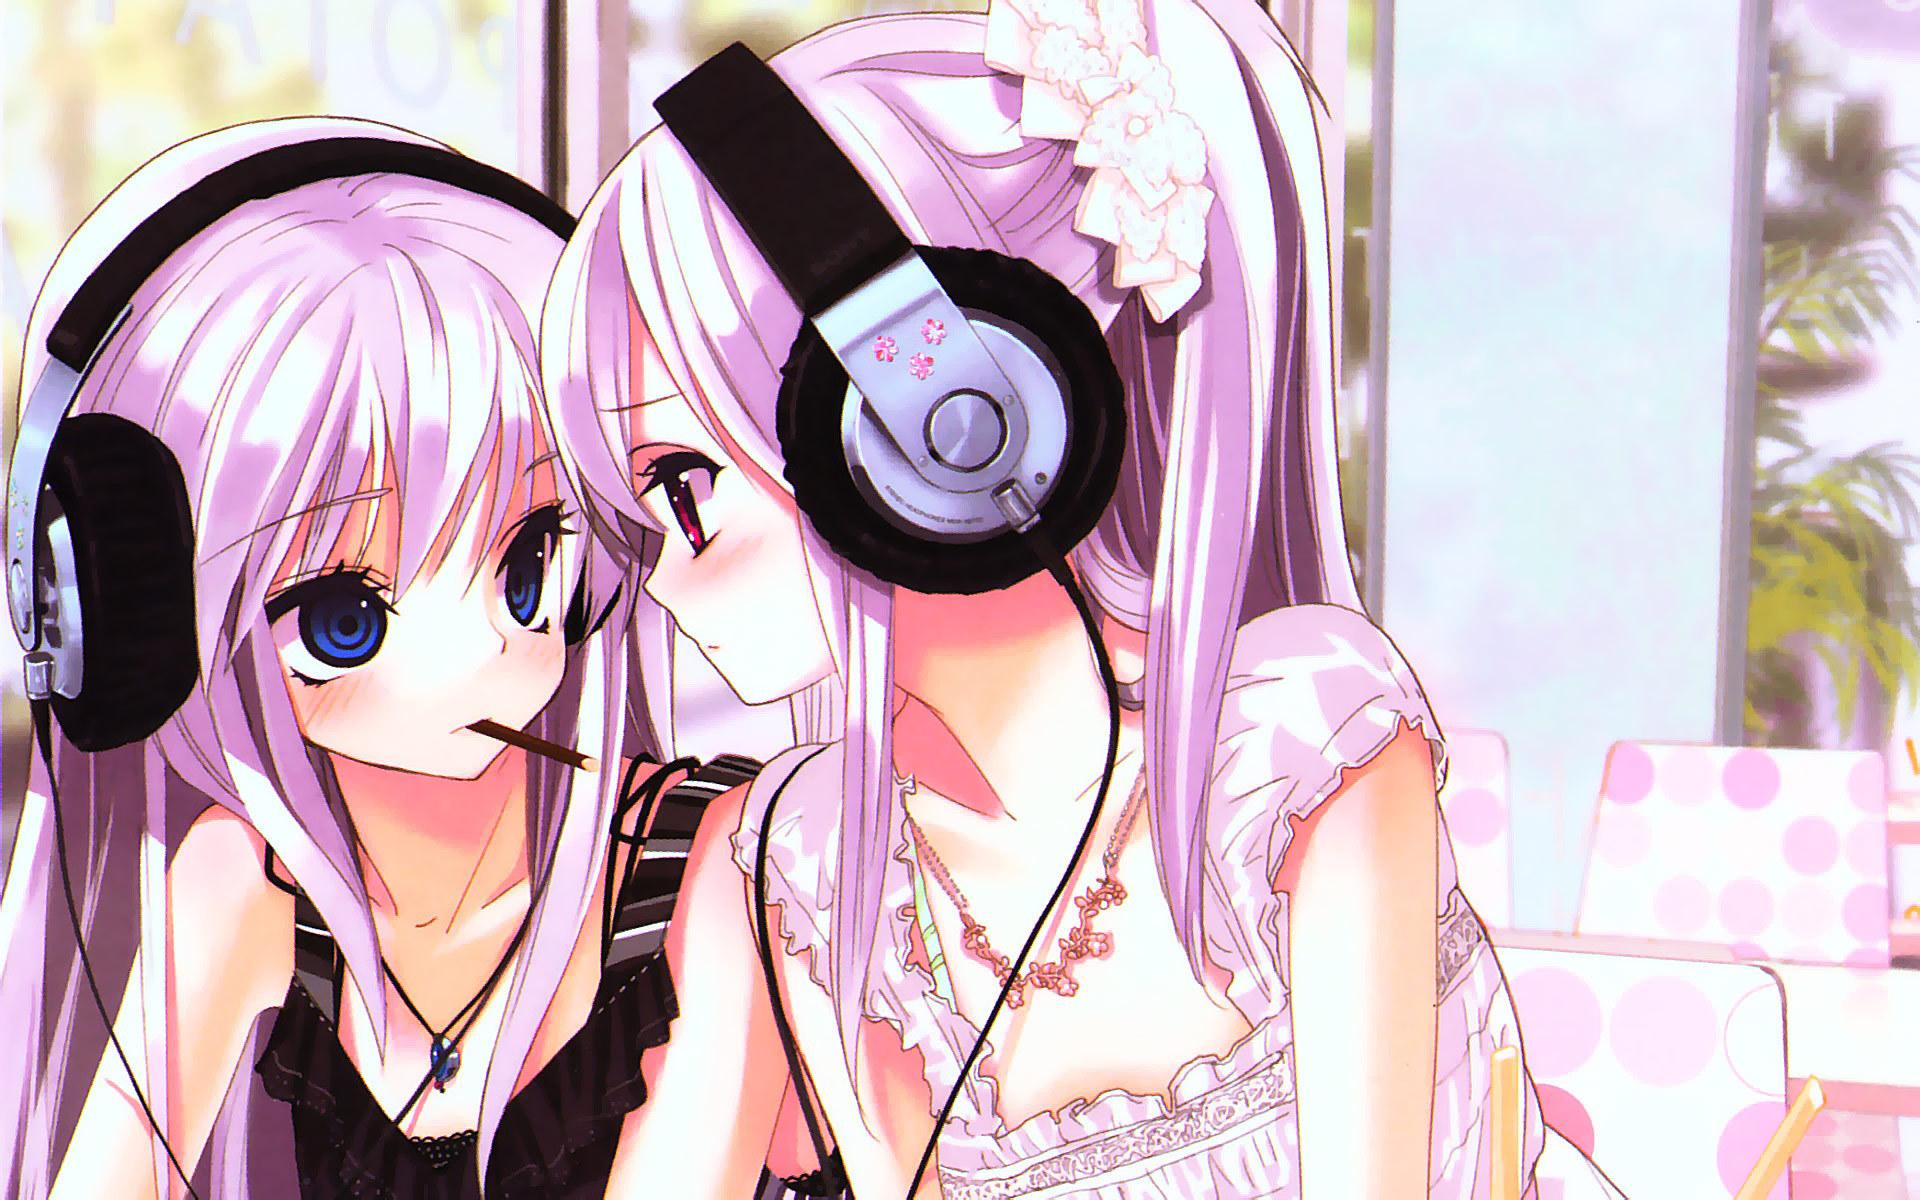 anime music images k - photo #37